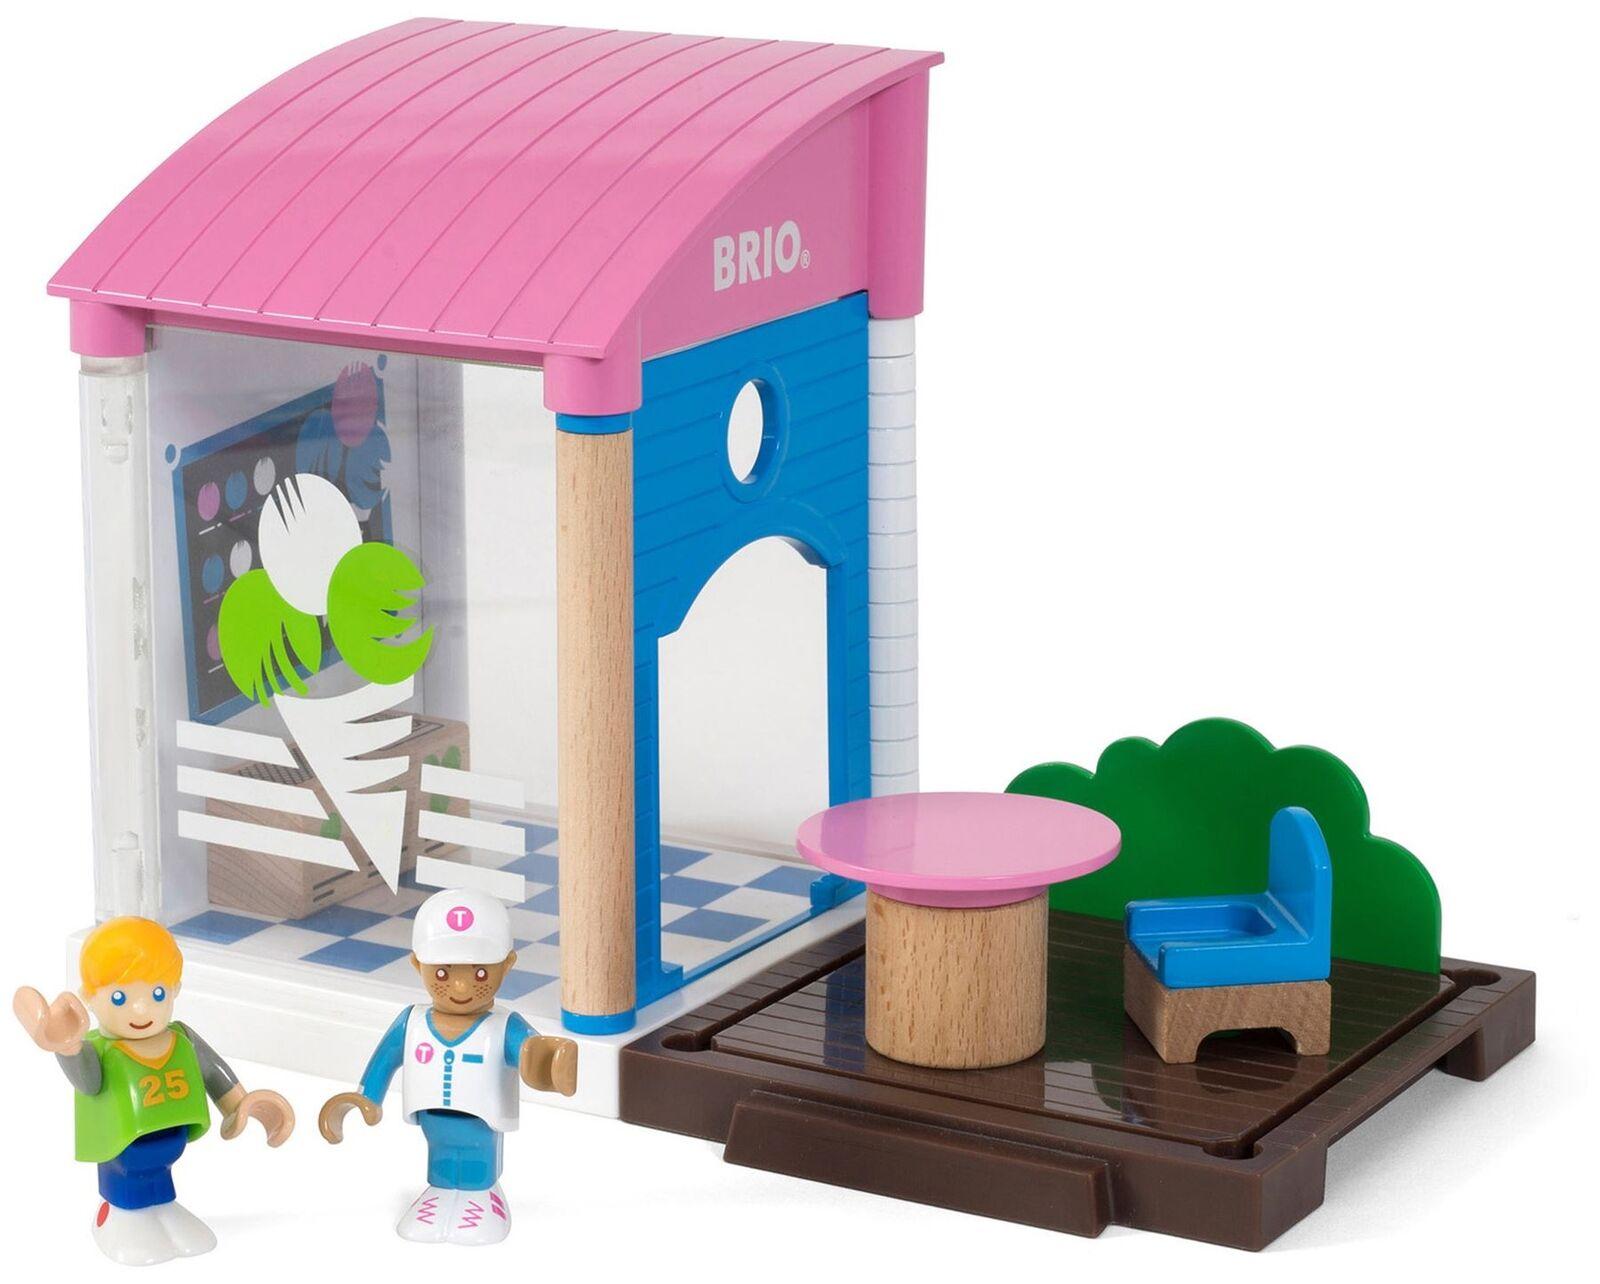 Brio ICE CREAM SHOP Wooden Toy Figures BN